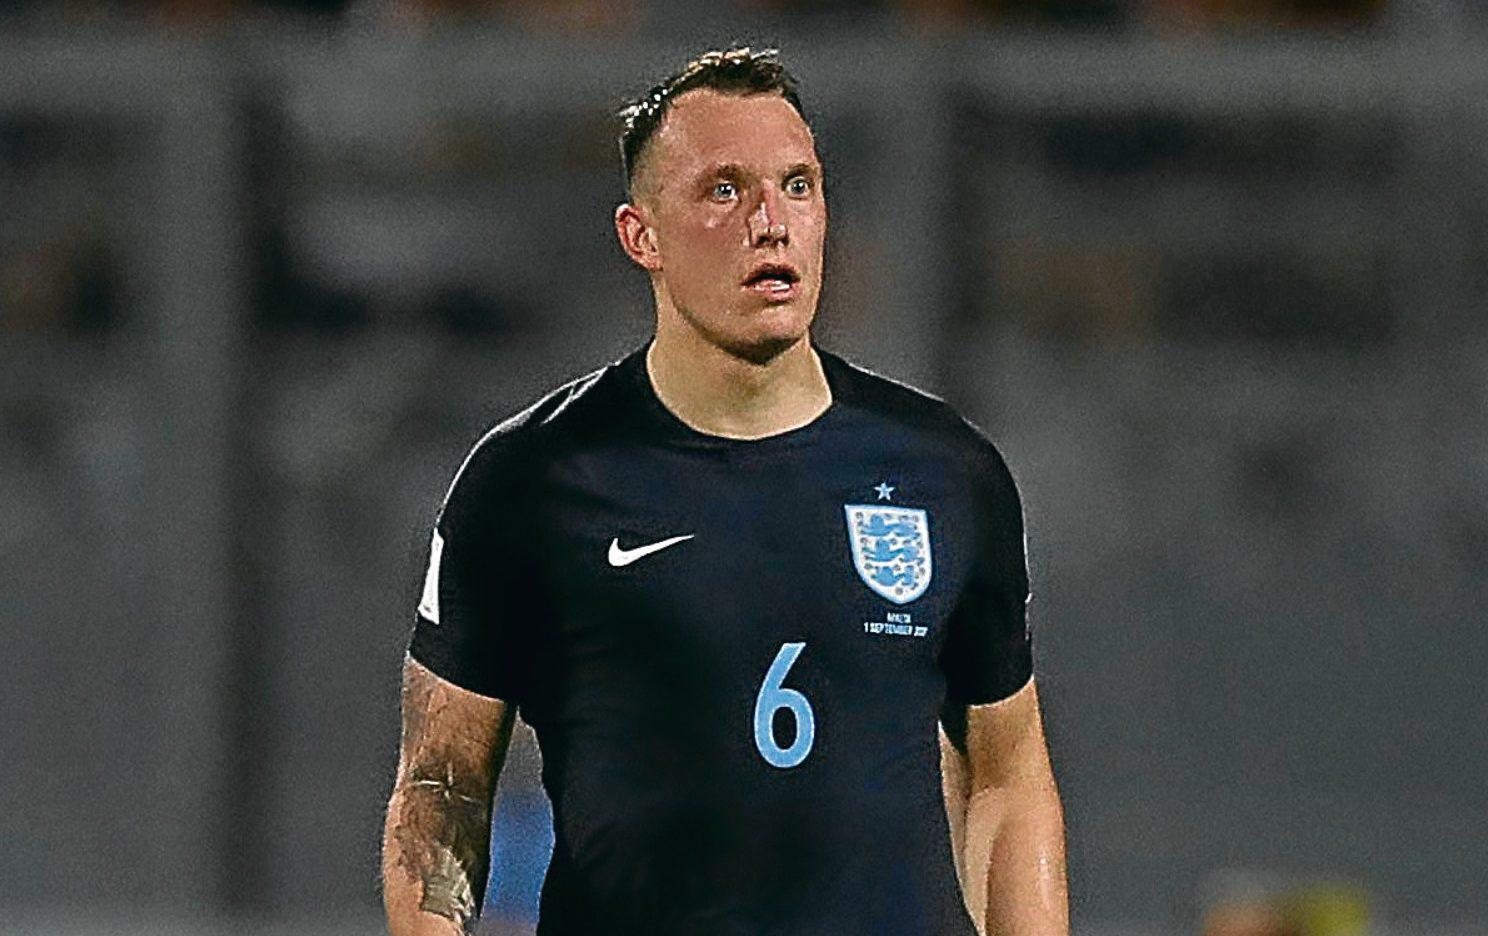 Phil Jones in action for England (Kieran McManus/BPI/REX/Shutterstock )